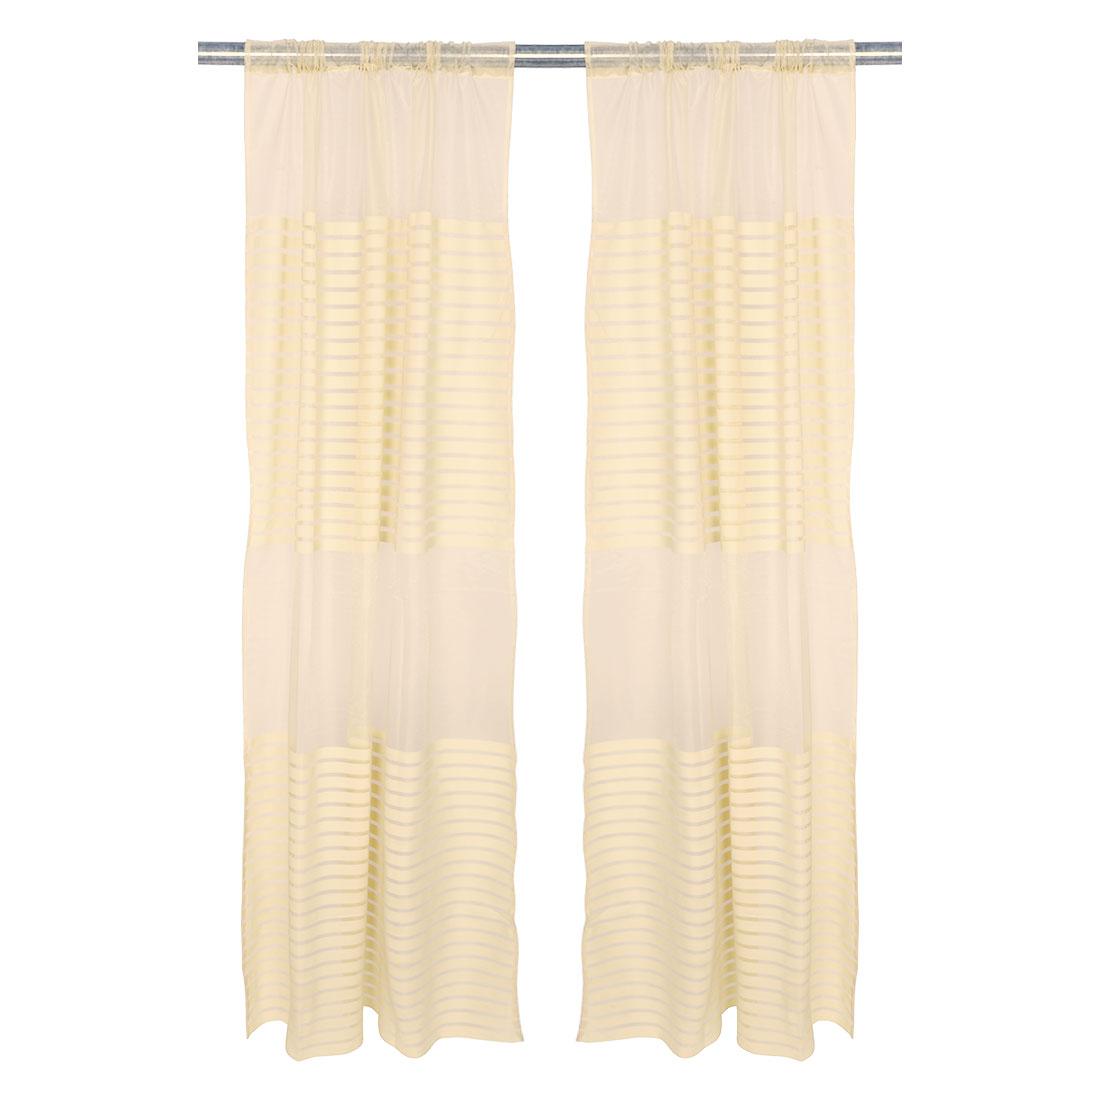 Home Bedroom Stripe Pattern Decorative Window Sheer Curtain Beige 100 x 200cm